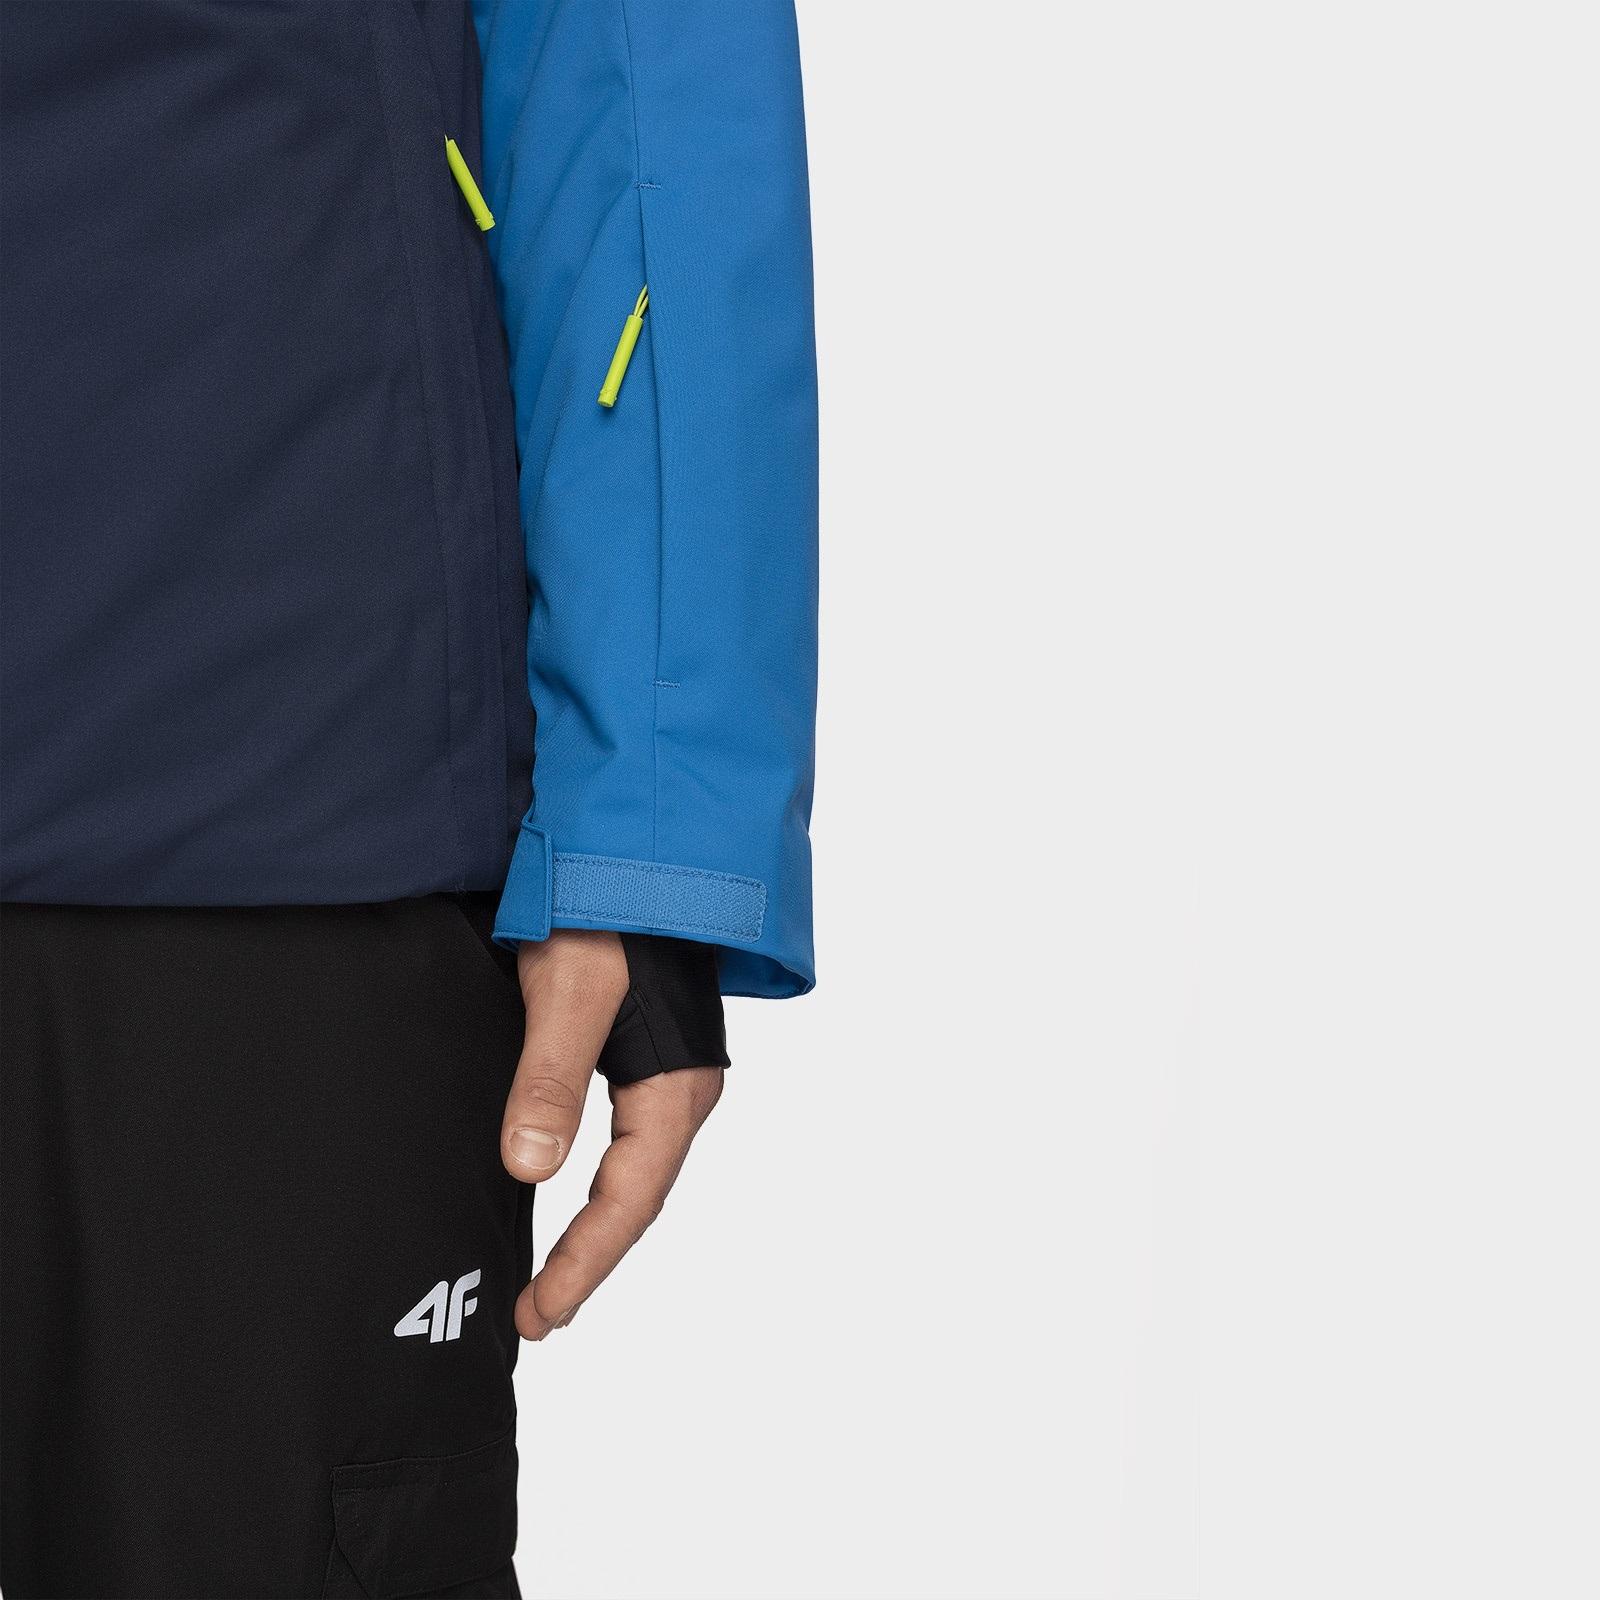 Ski & Snow Jackets -  4f Men 4FPRO Ski Jacket KUMN011